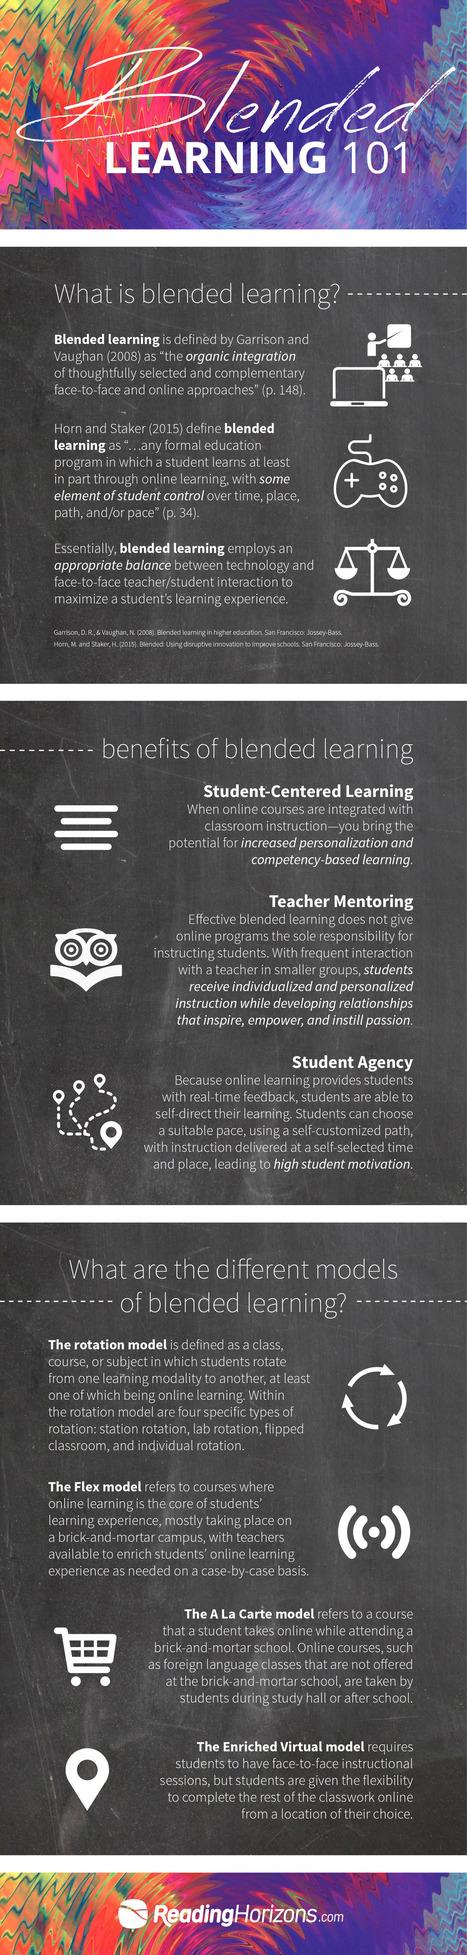 Blended Learning 101 Infographic - e-Learning Infographics | blended learning | Scoop.it